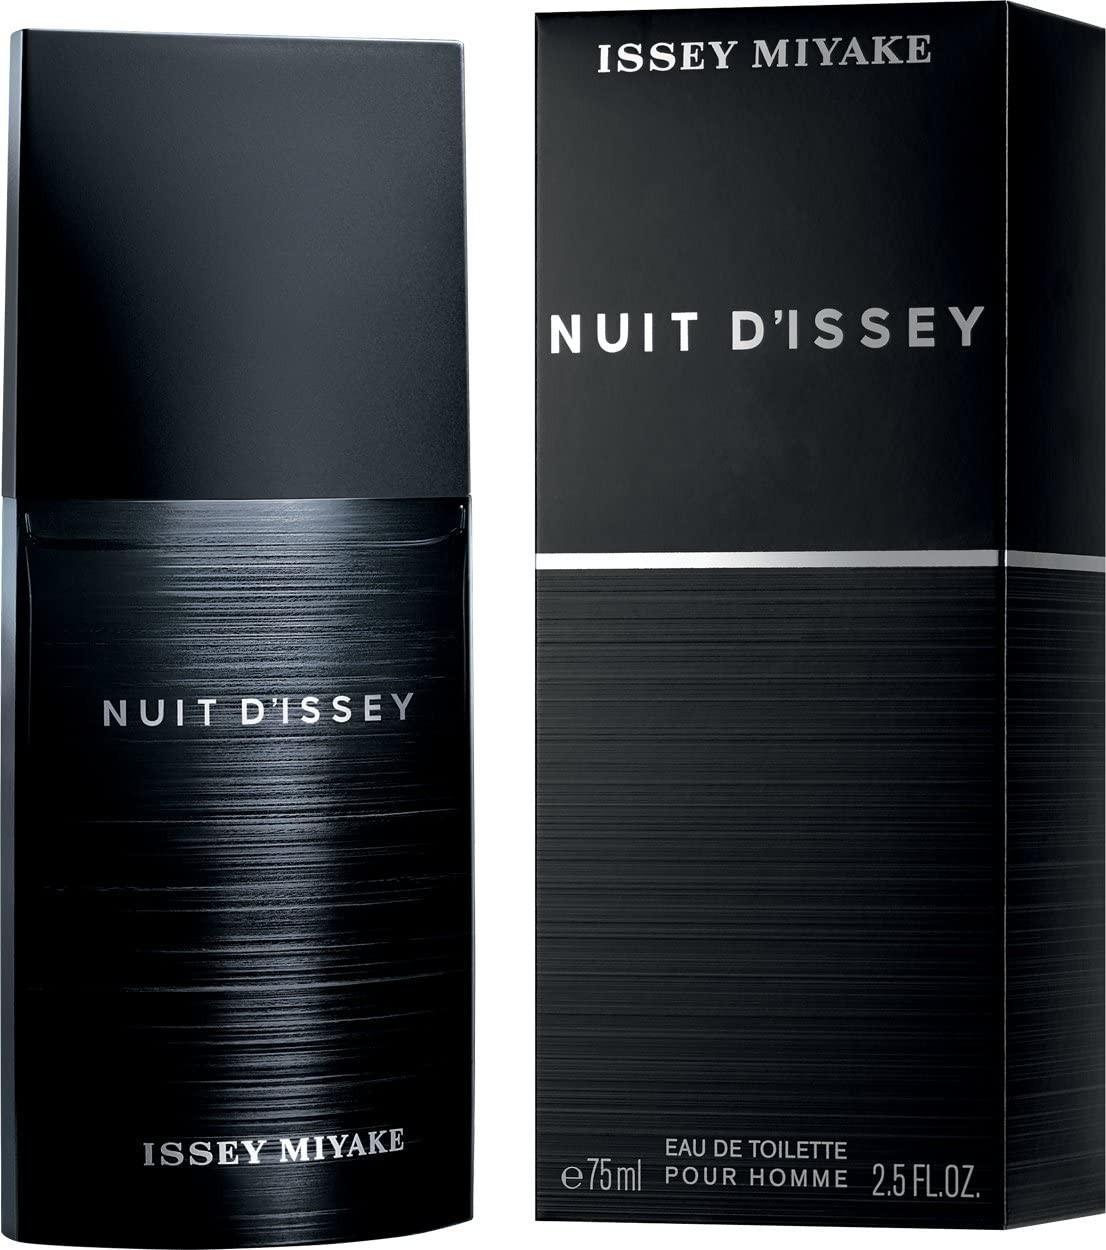 Issey Miyake Nuit D'Issey Eau de Toilette Spray for Men, 75 ml